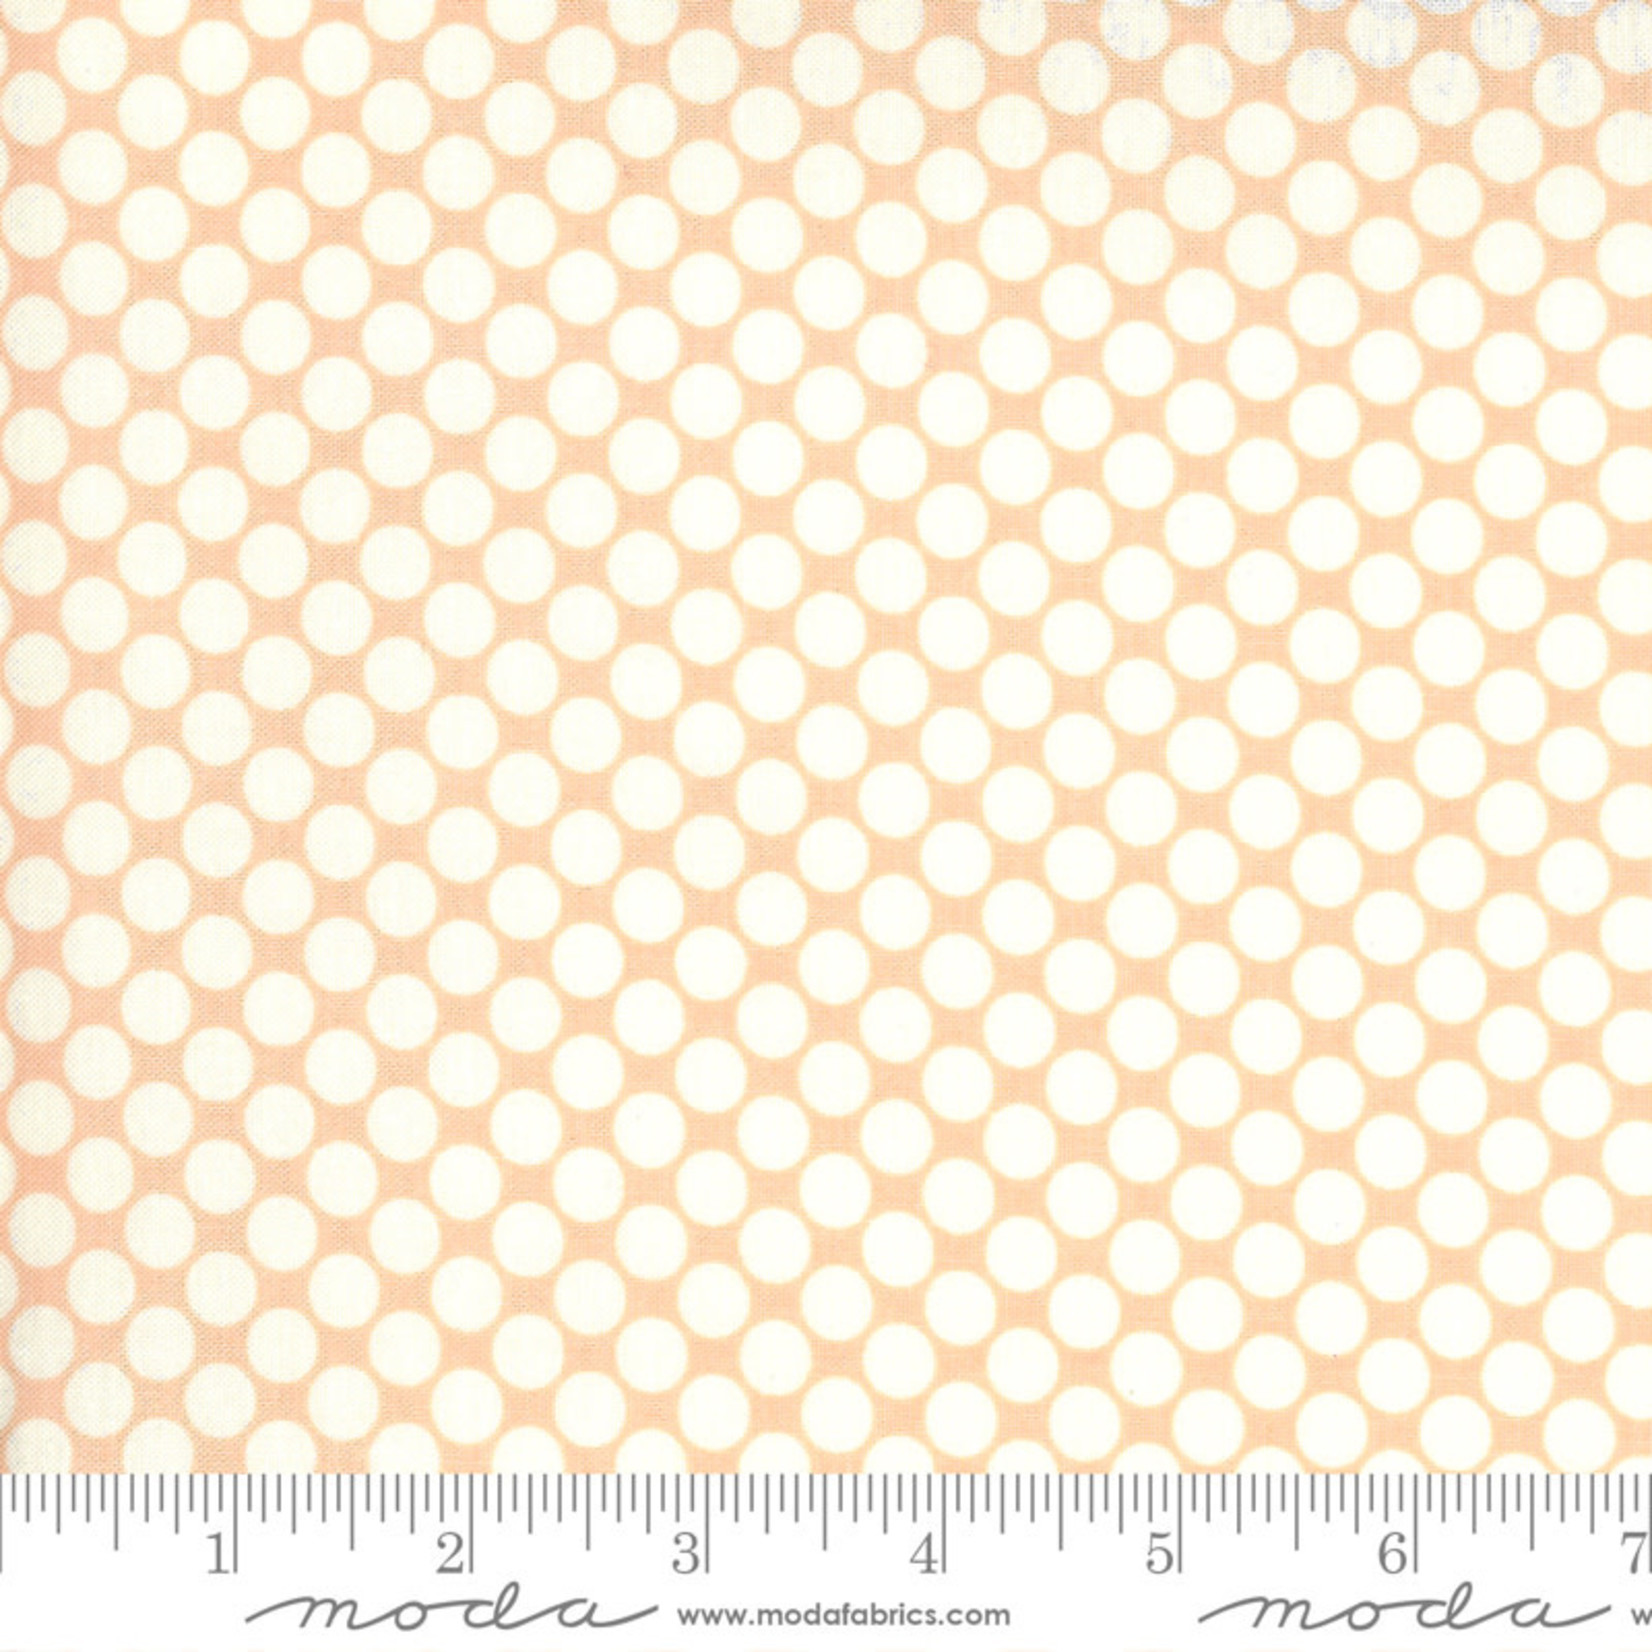 Urban Chiks Kitty Corn, Polka Dot, Bubble Gum 31176-12 $0.20 per cm or $20/m